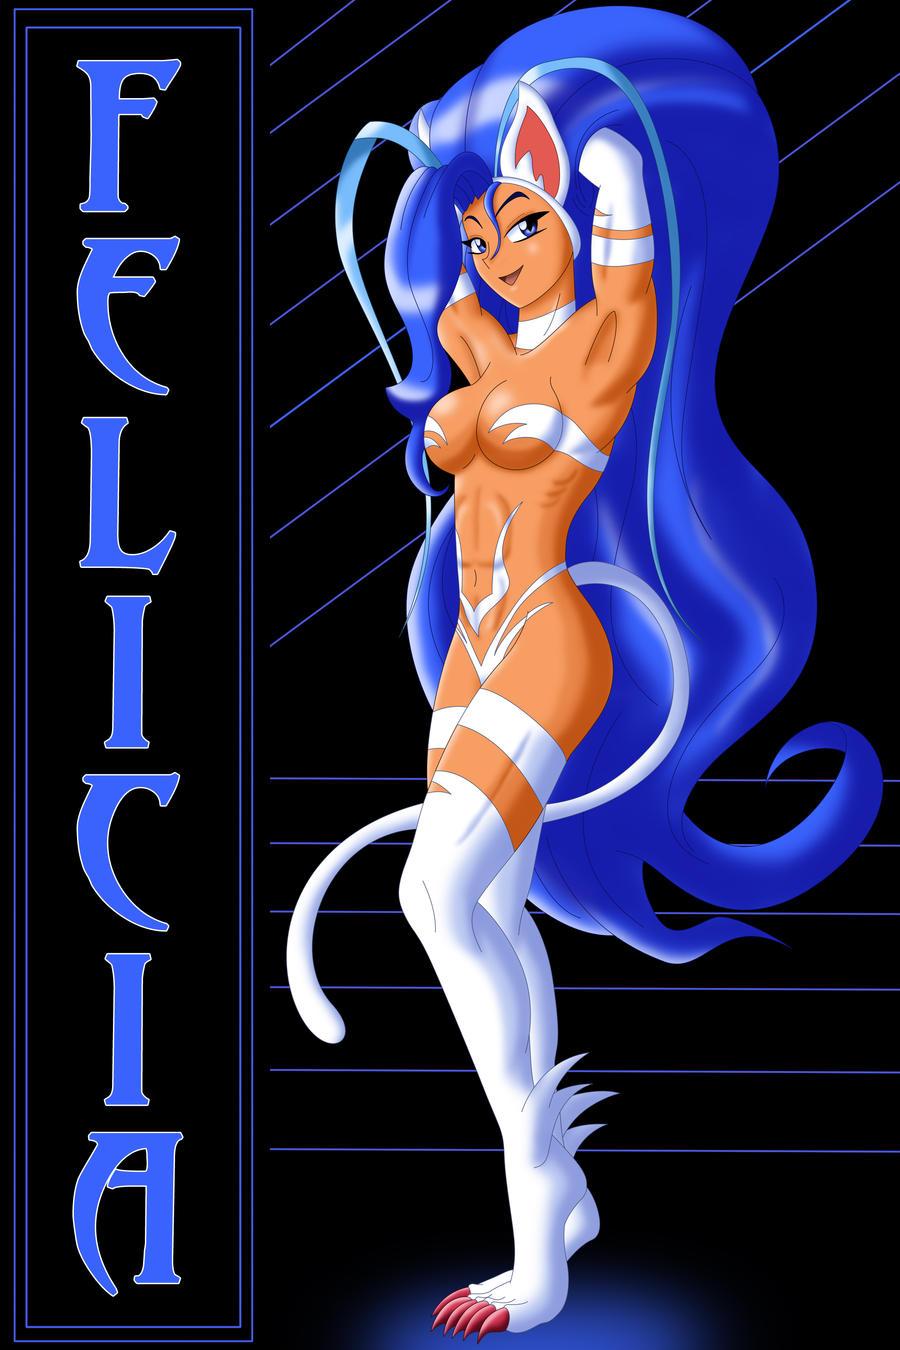 Catgirl Felicia by AtlasMaximus